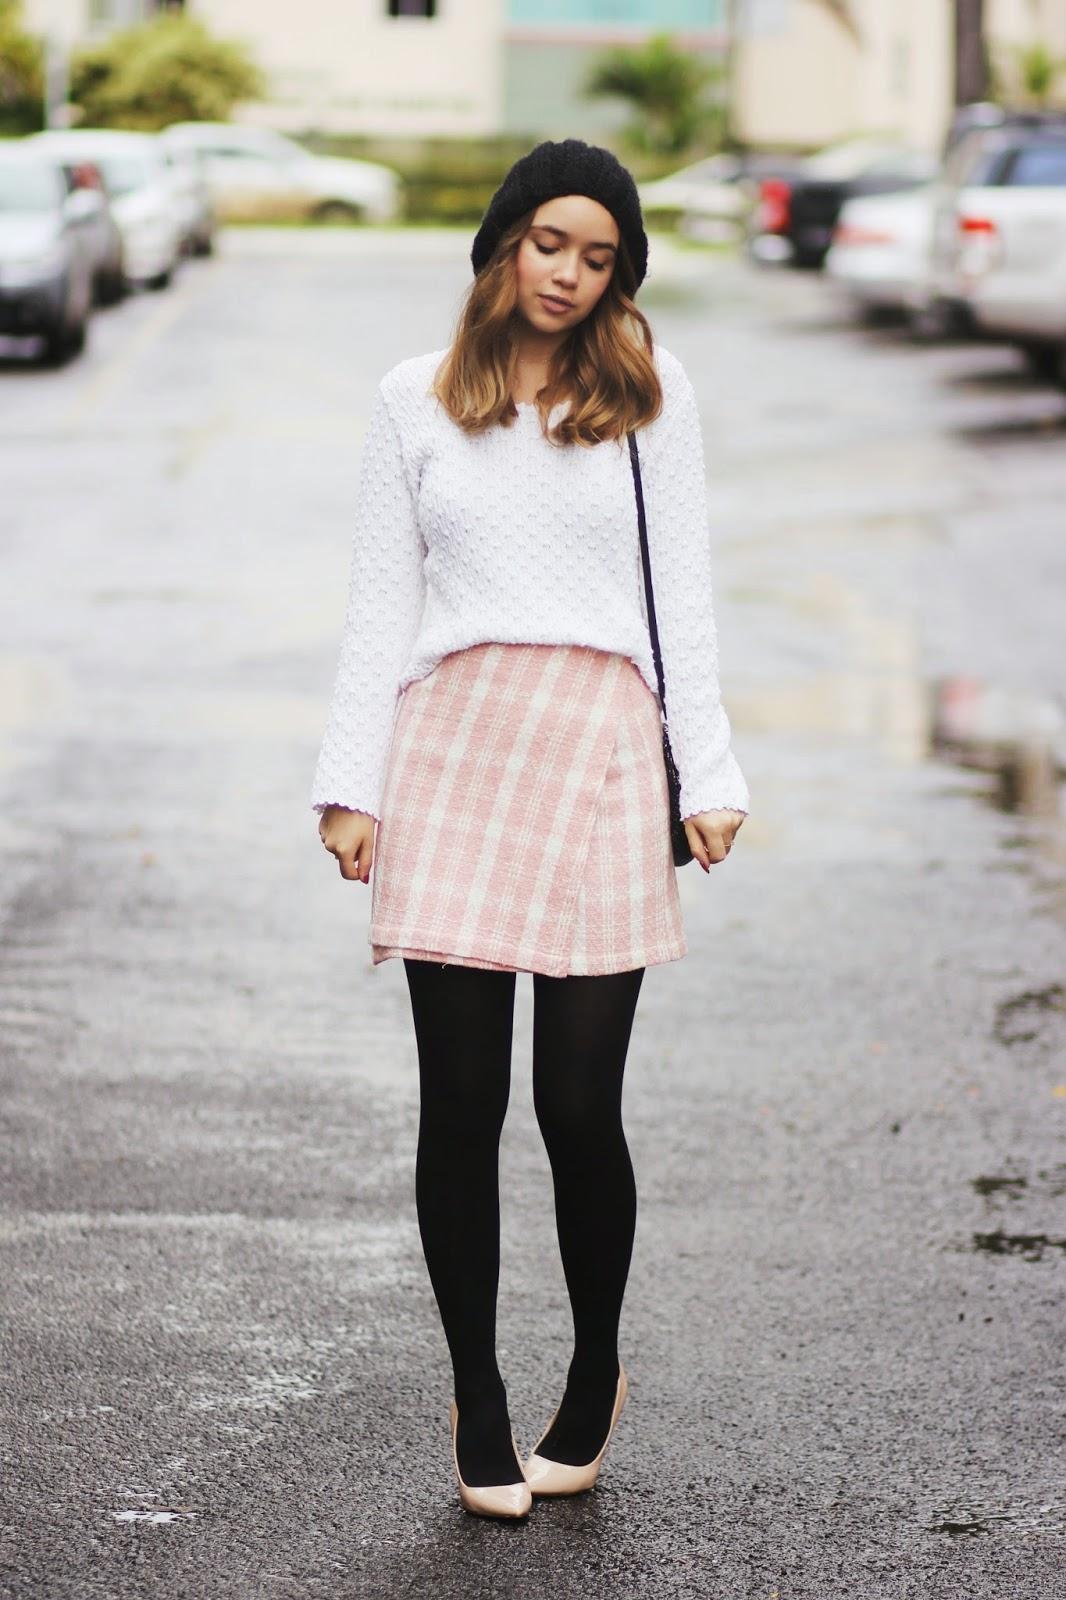 Meia Calça trançada   Net fashion, Fish net tights outfit, Trendy clothes for women